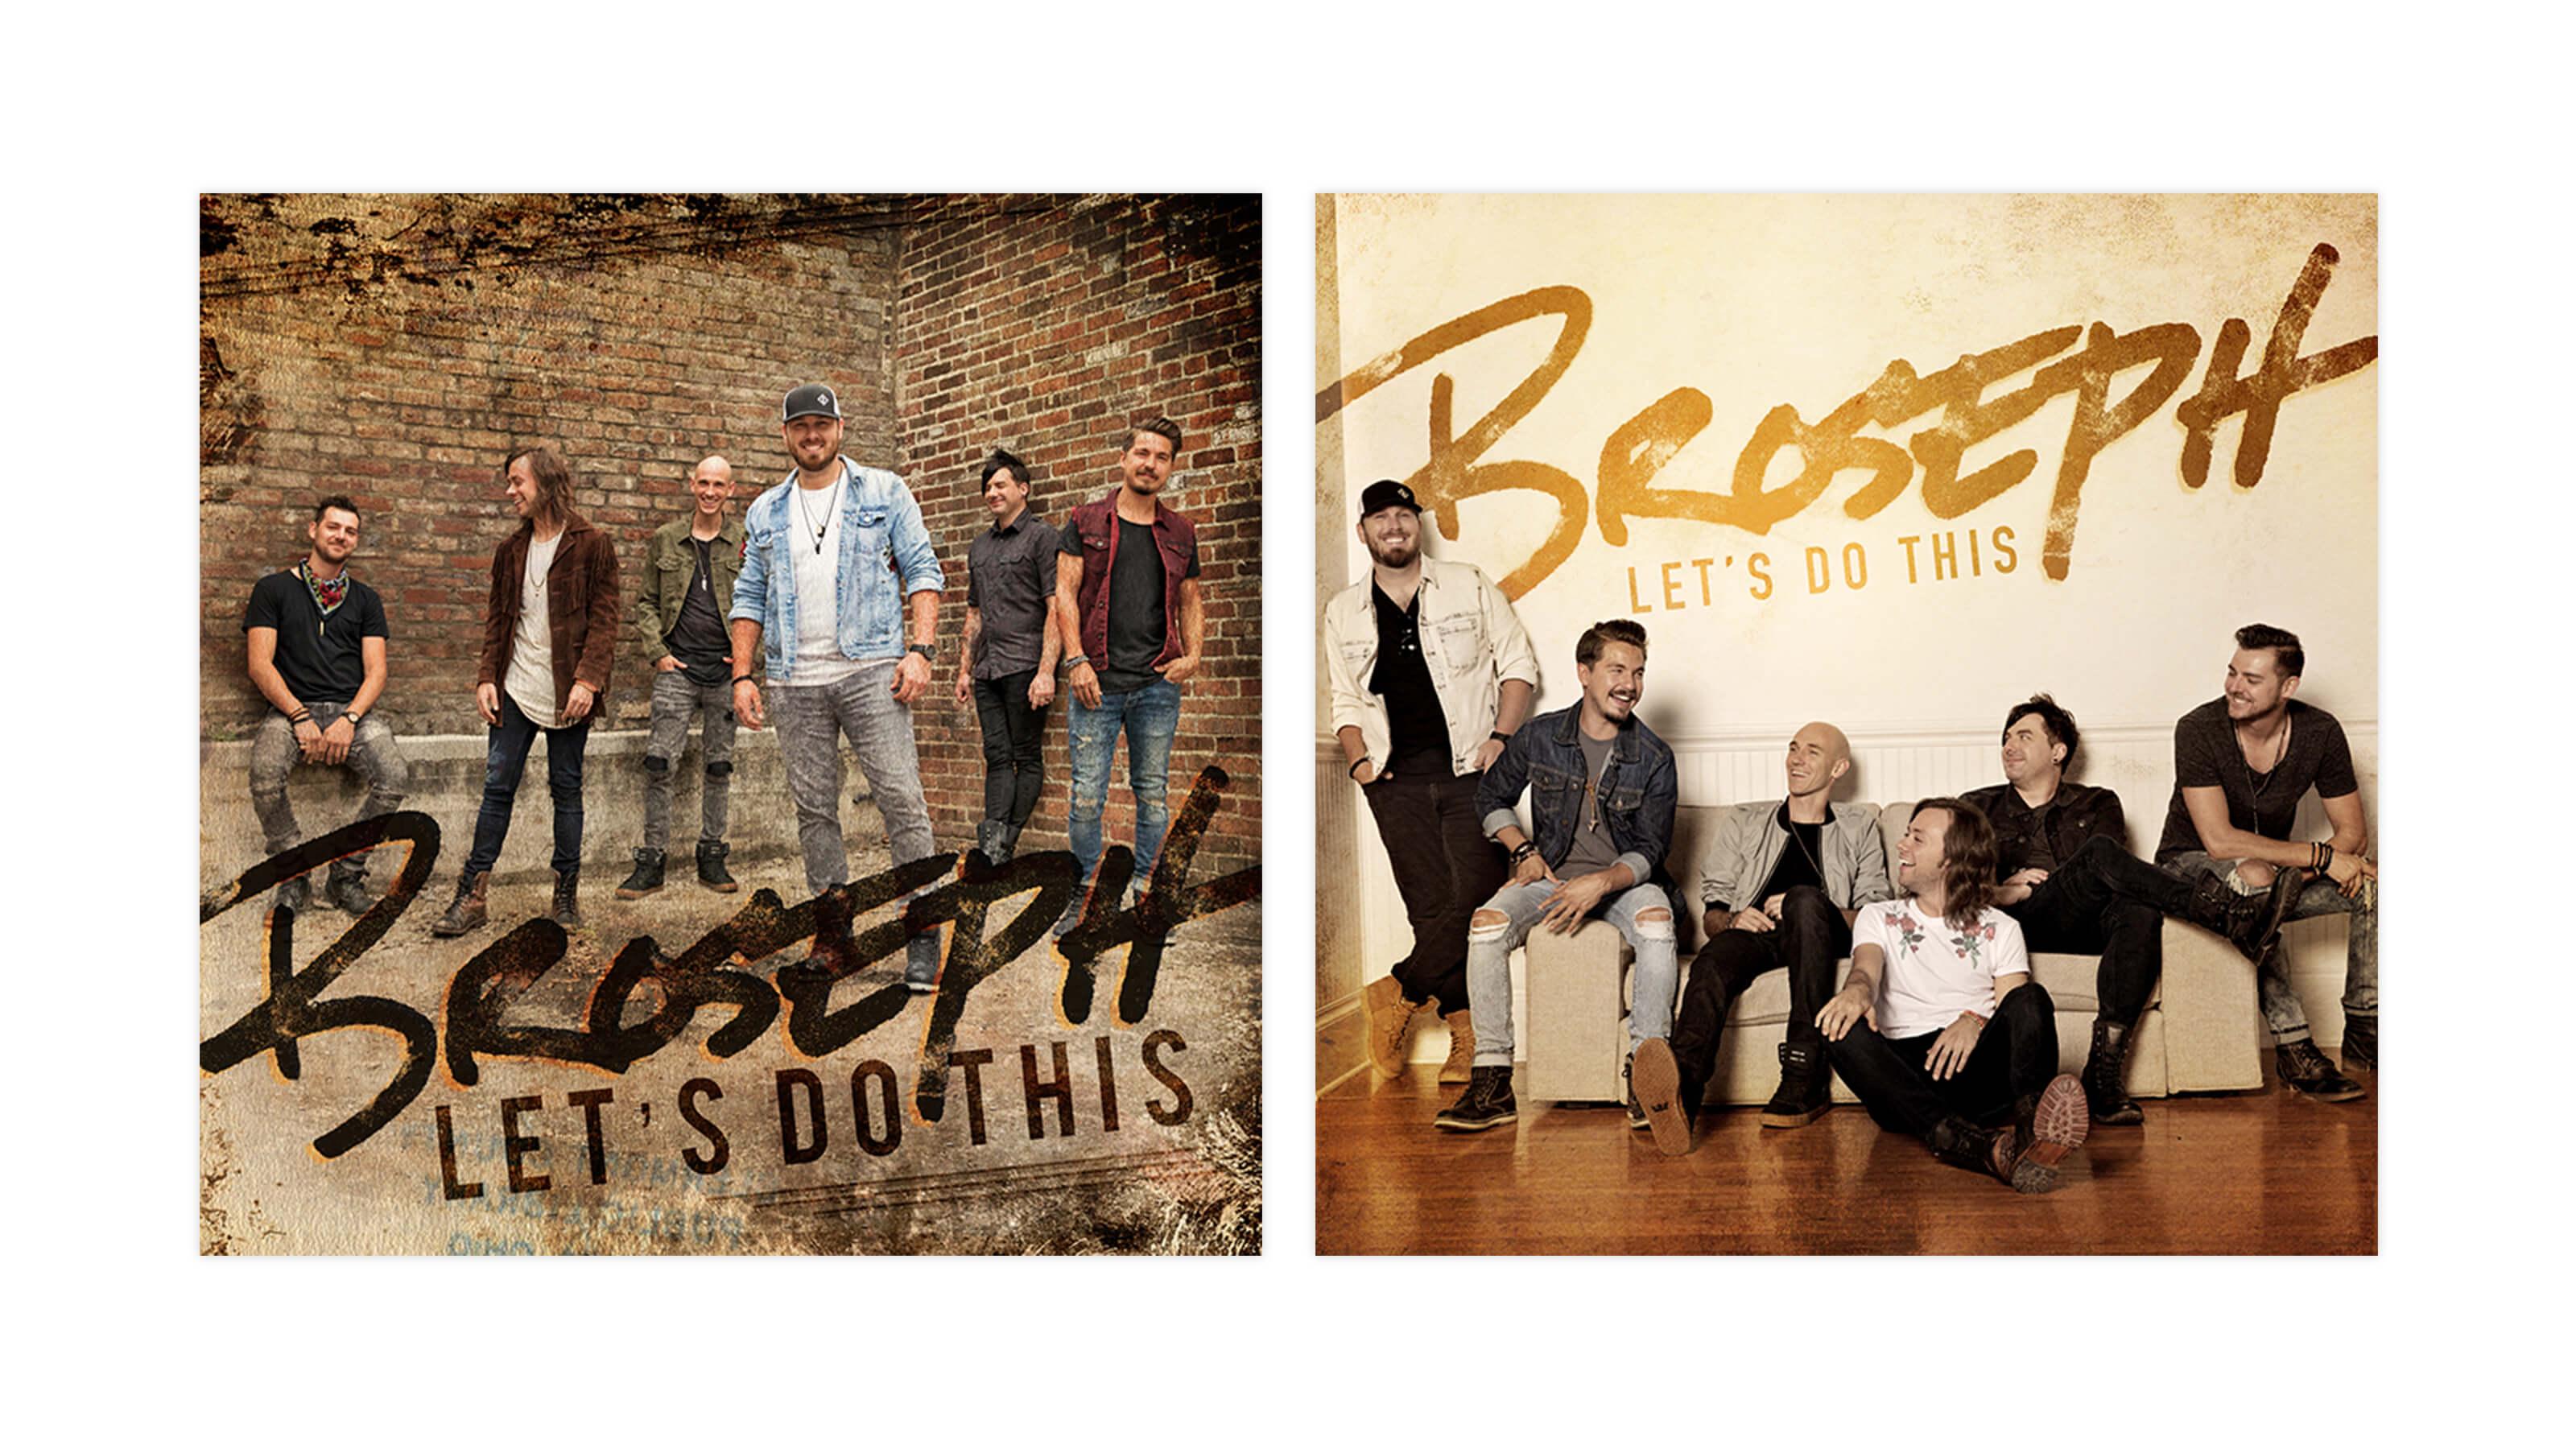 Broseph unused EP Album covers designed by Ben Fieker for Fieker Brothers website